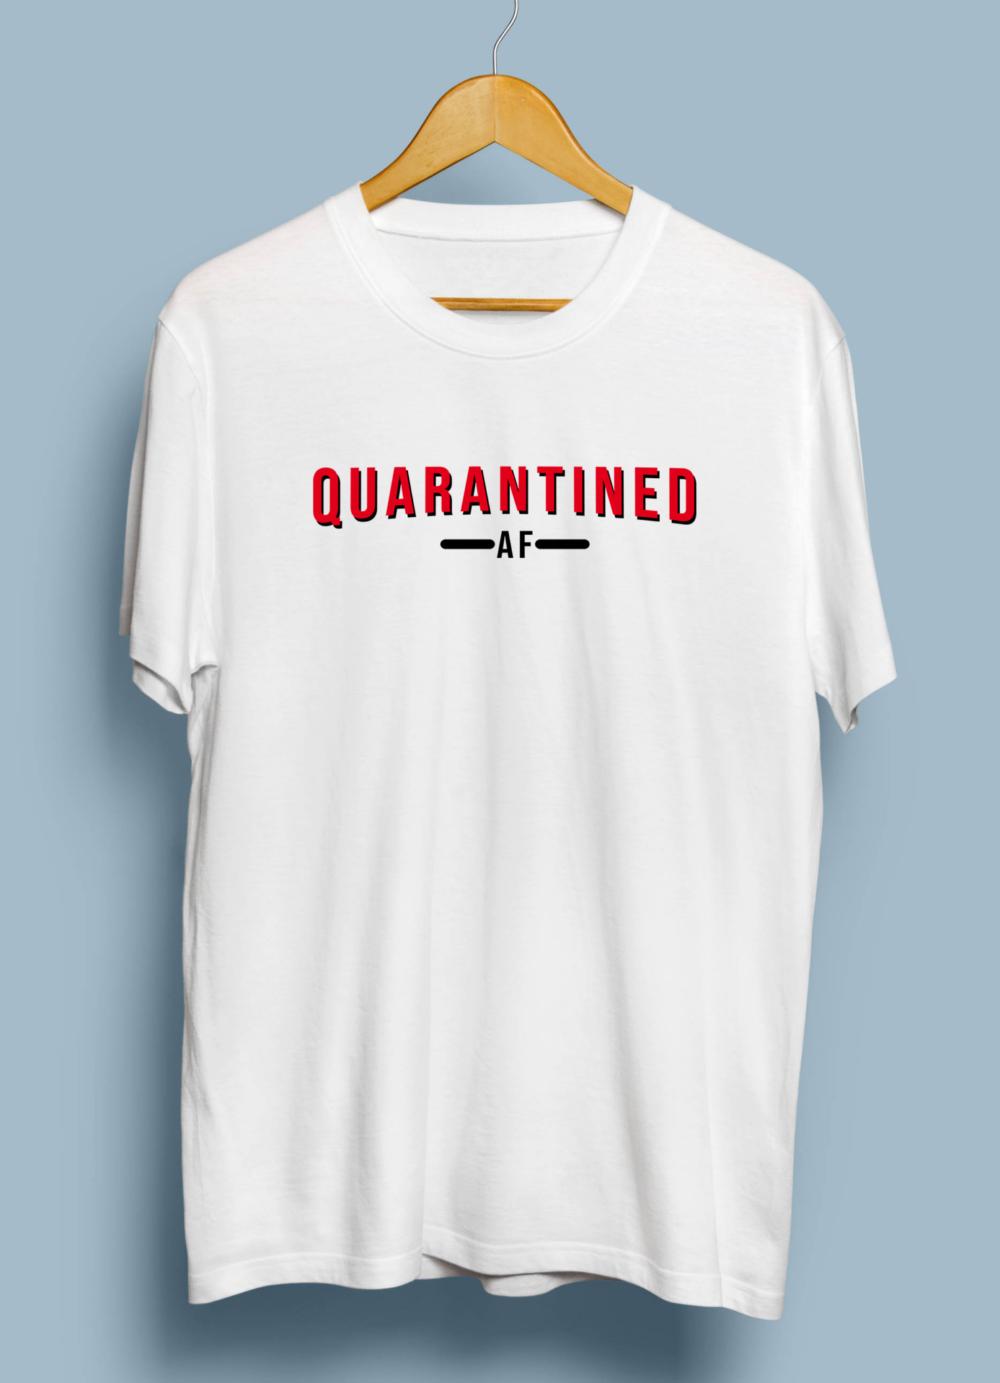 Telugu Trending Quarantined AF Graphic Printed T shirt